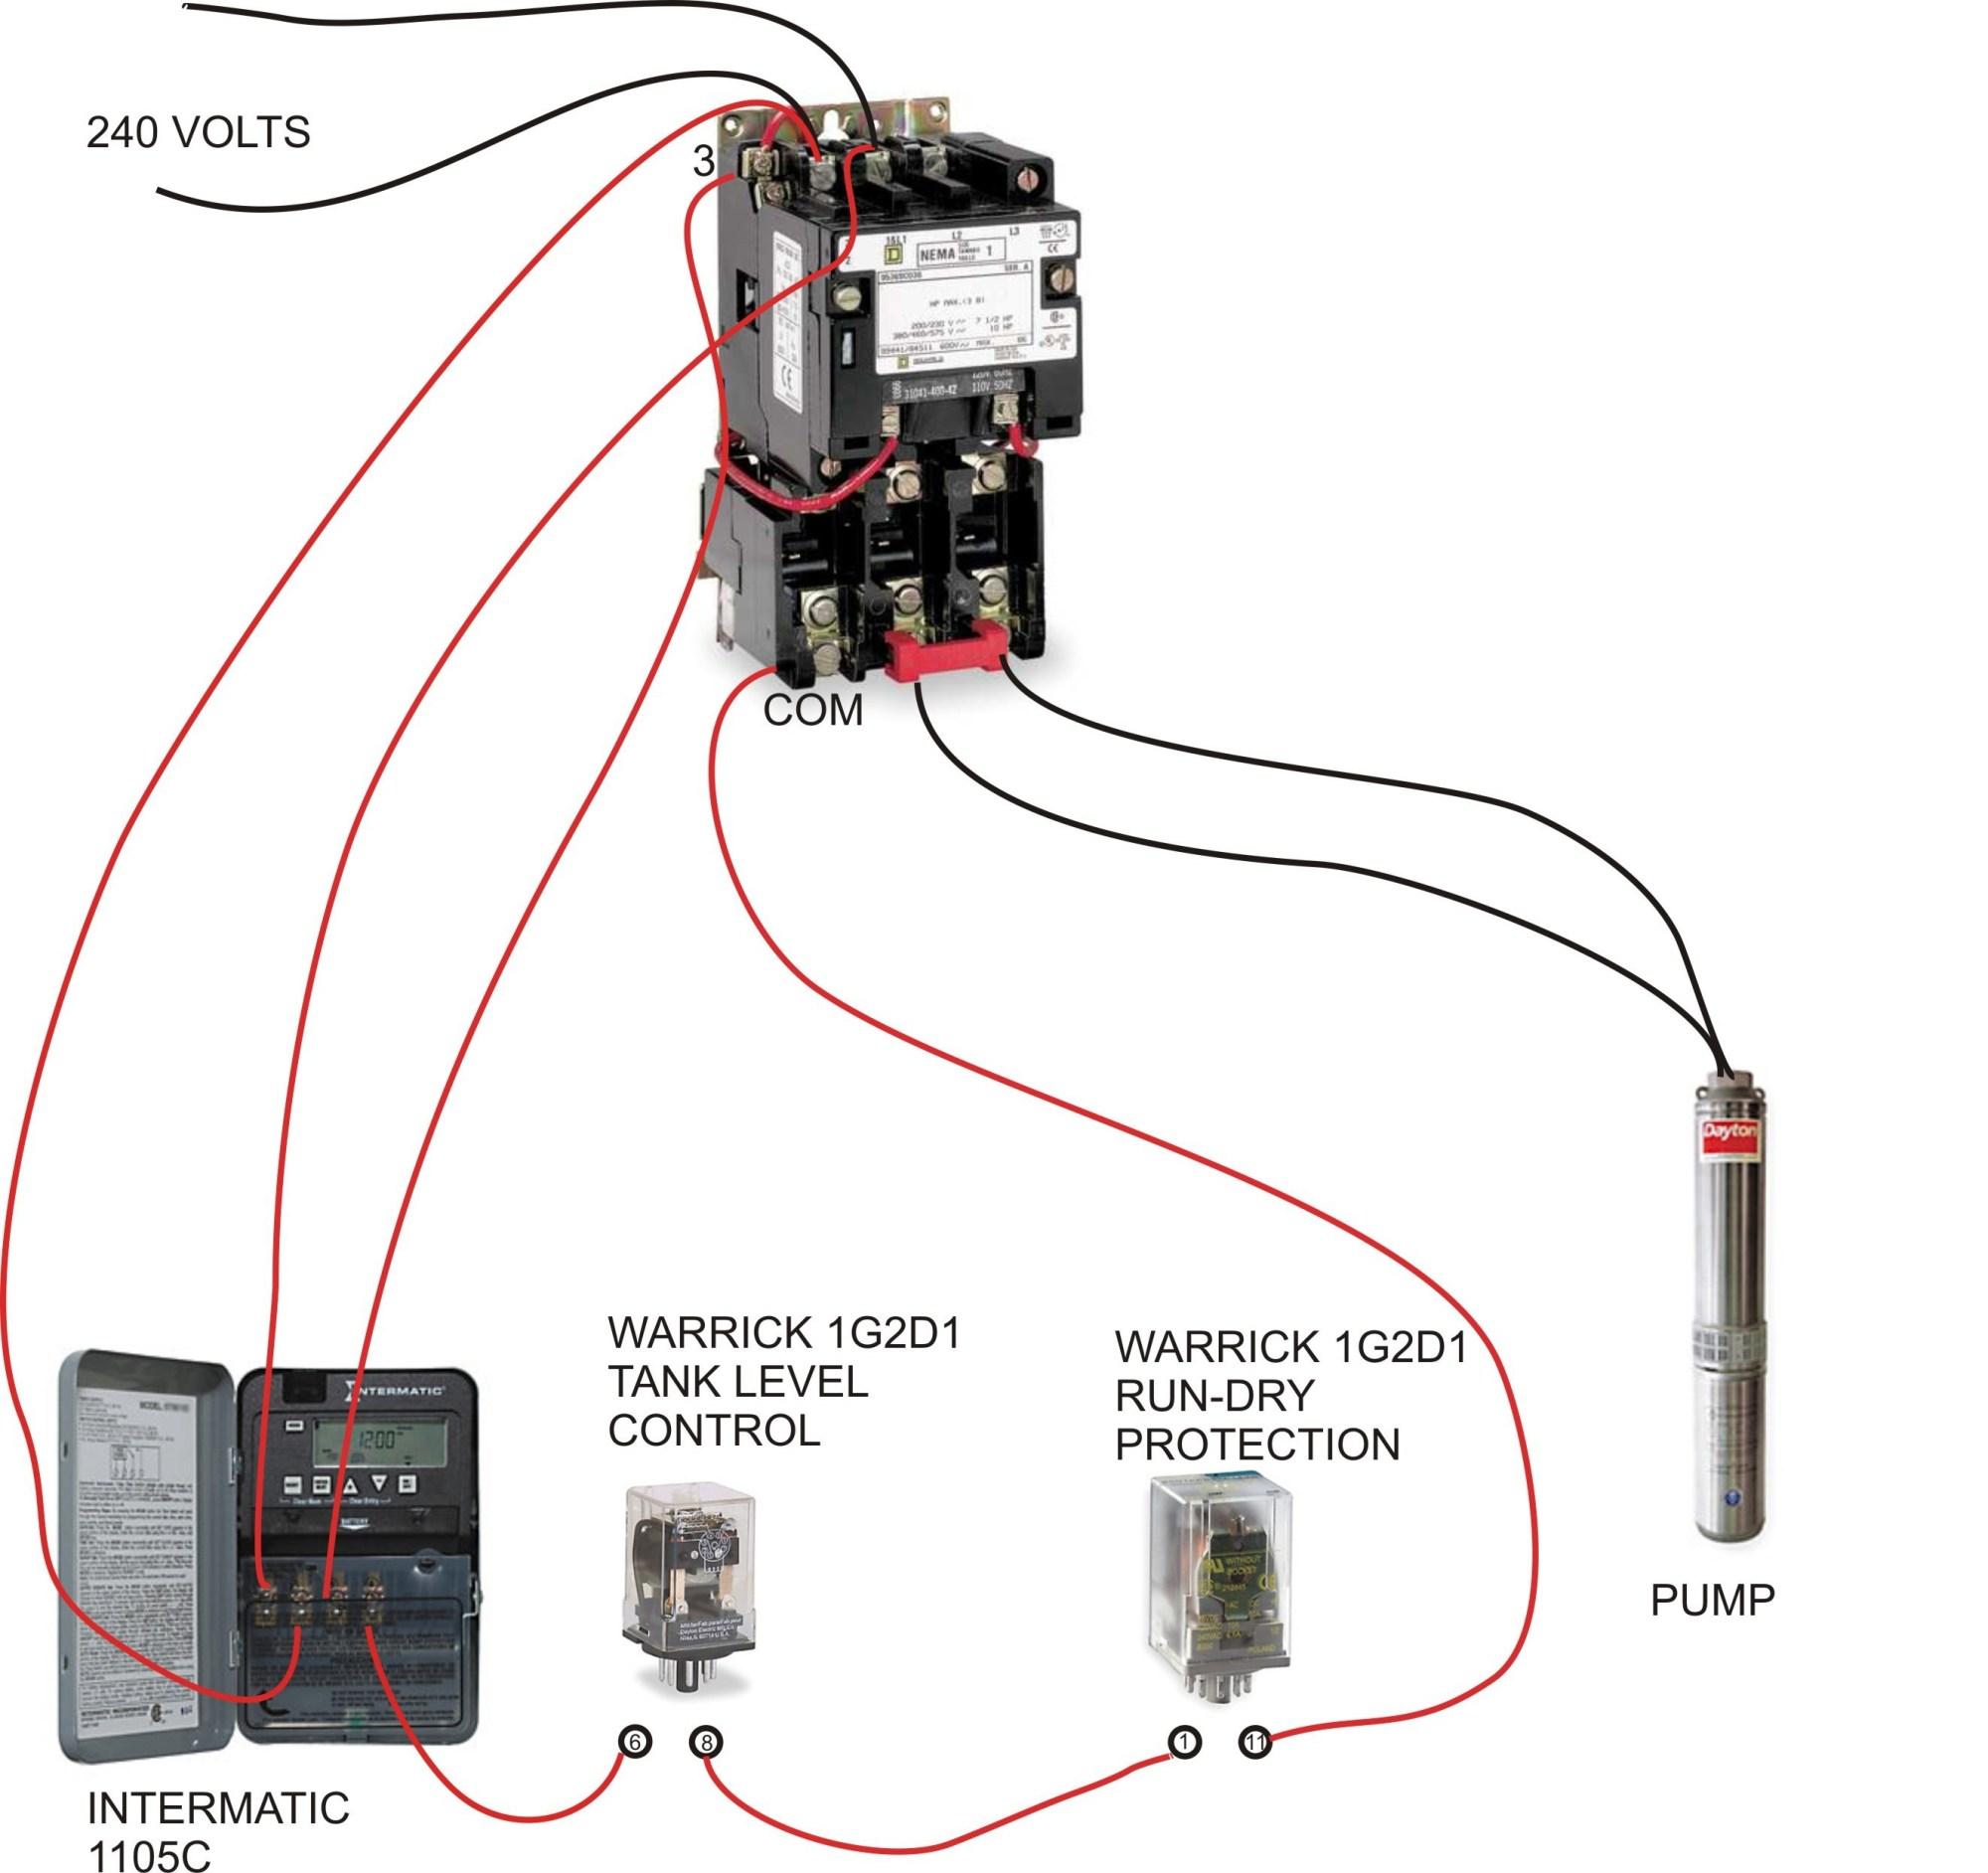 hight resolution of pressure switch wiring diagram wiring diagram for water pump pressure switch valid water pump pressure